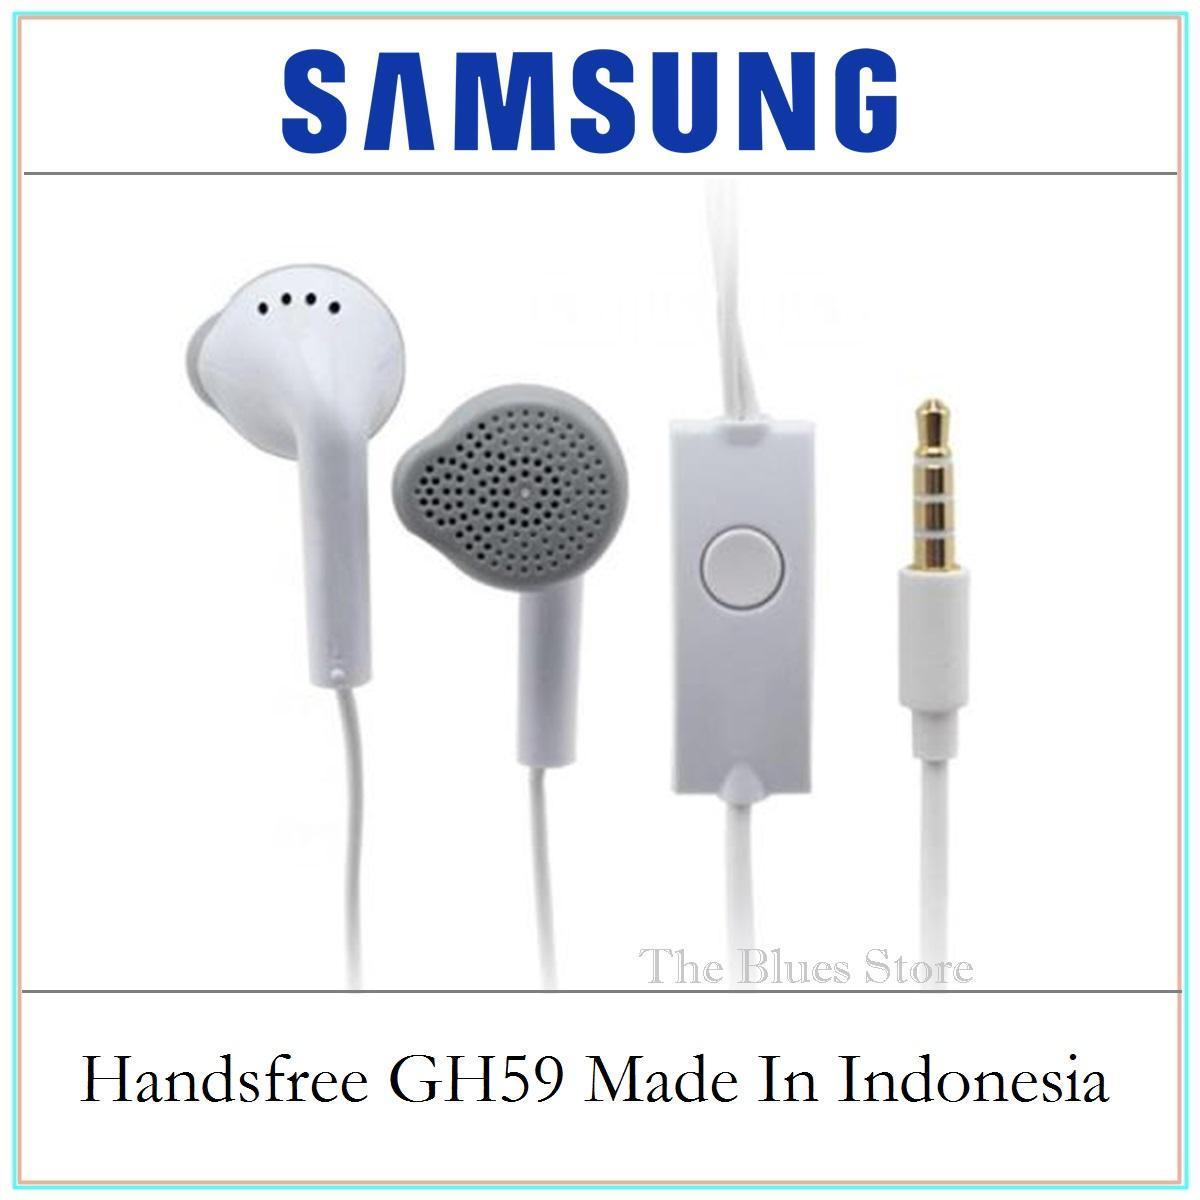 Samsung Handsfree GH59 Super Bass Made In Indonesia - Original